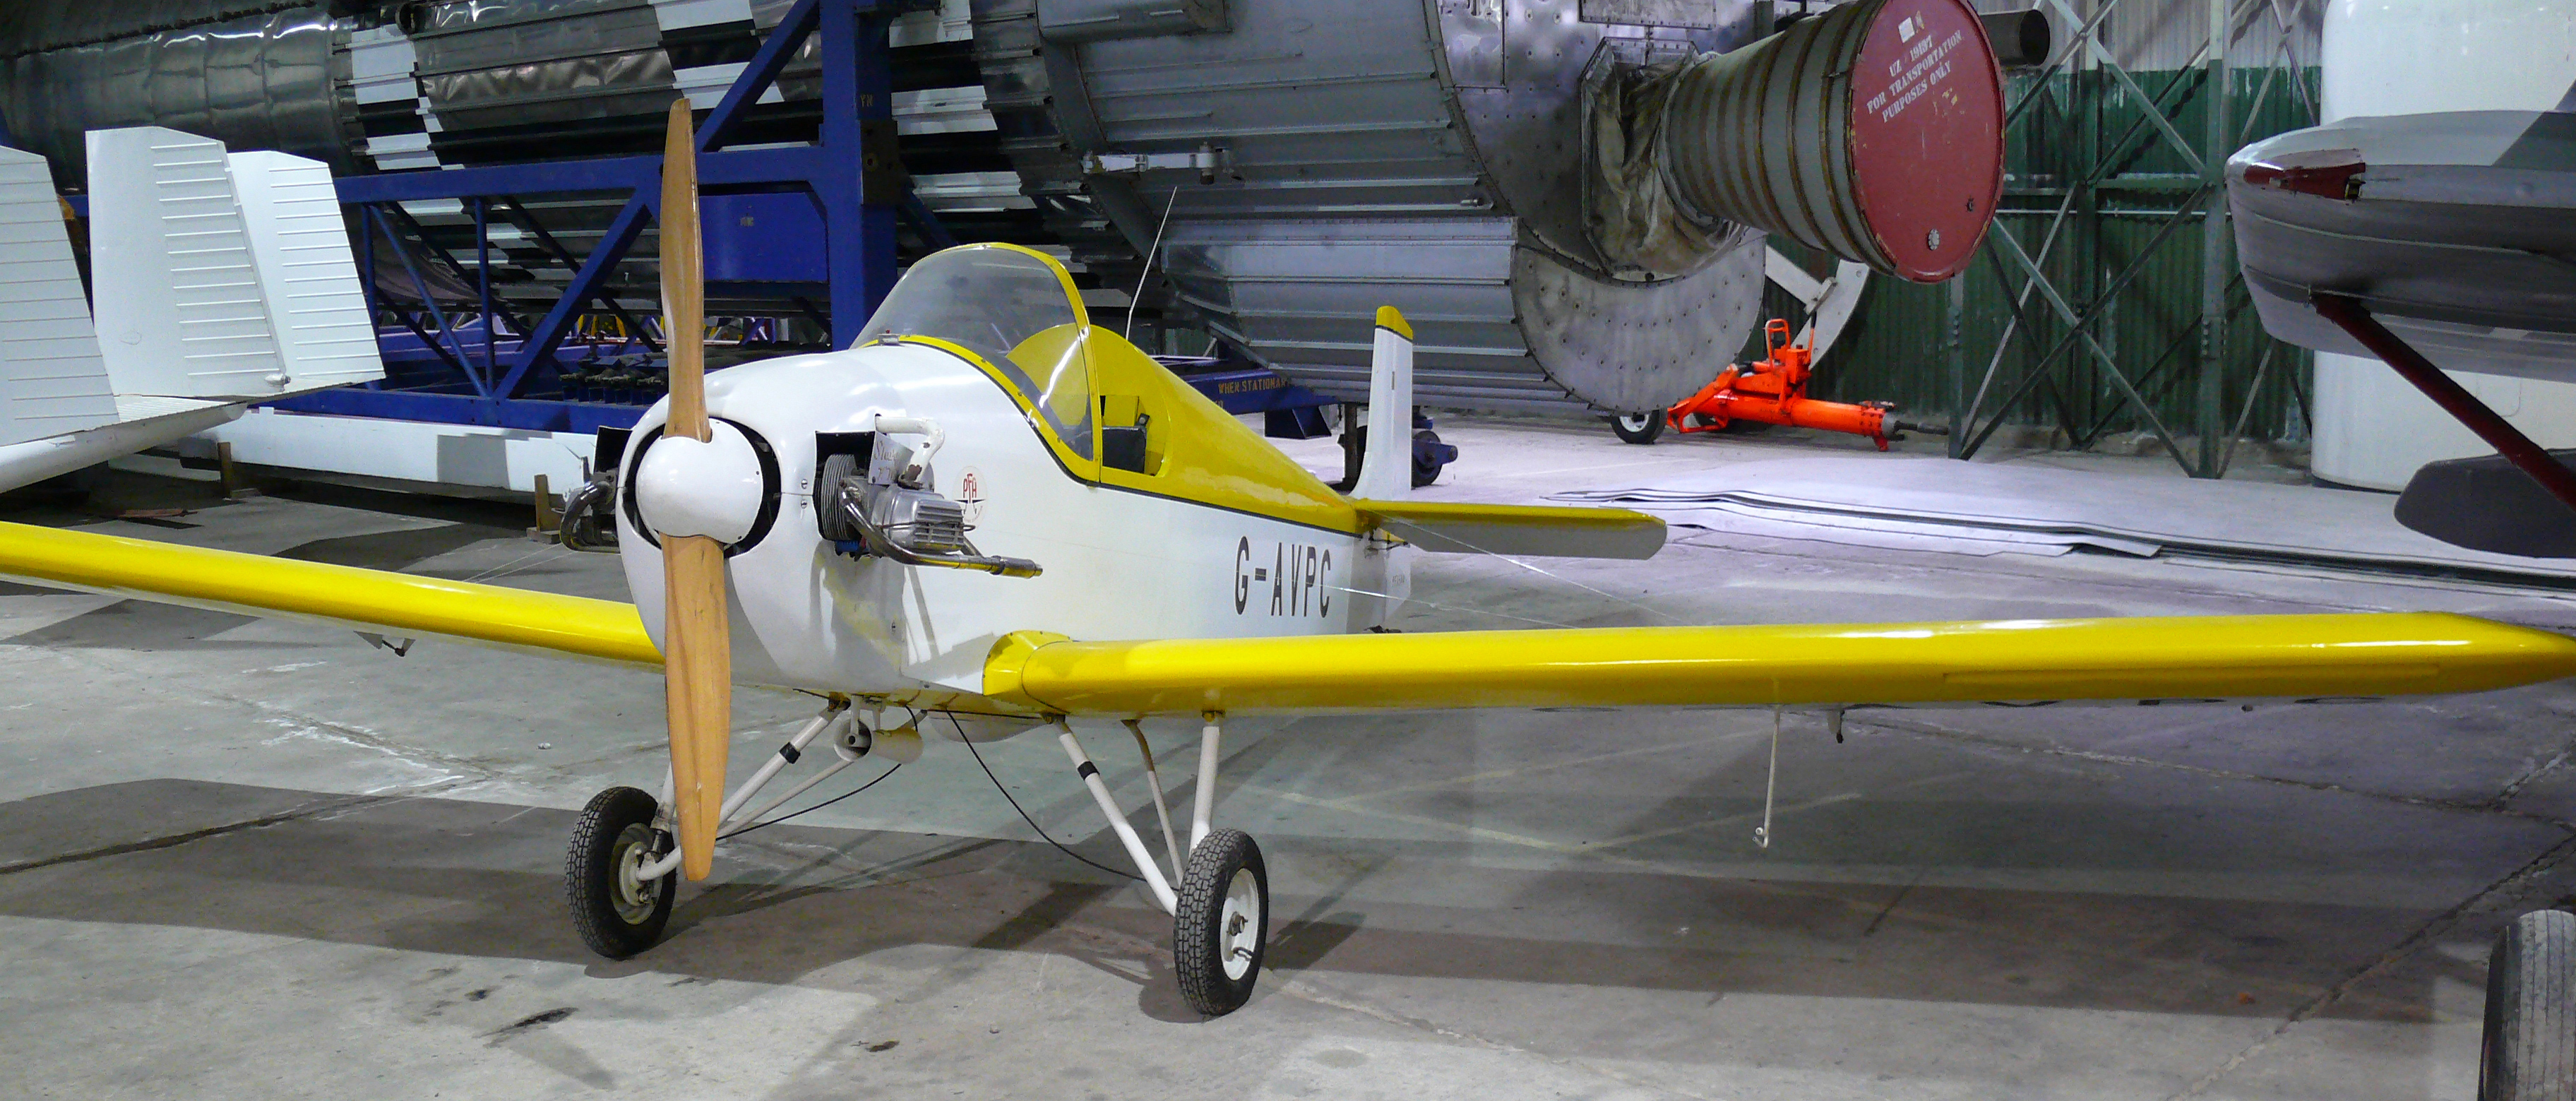 File museum of flight druine d31 turbulent 01 jpg wikimedia commons